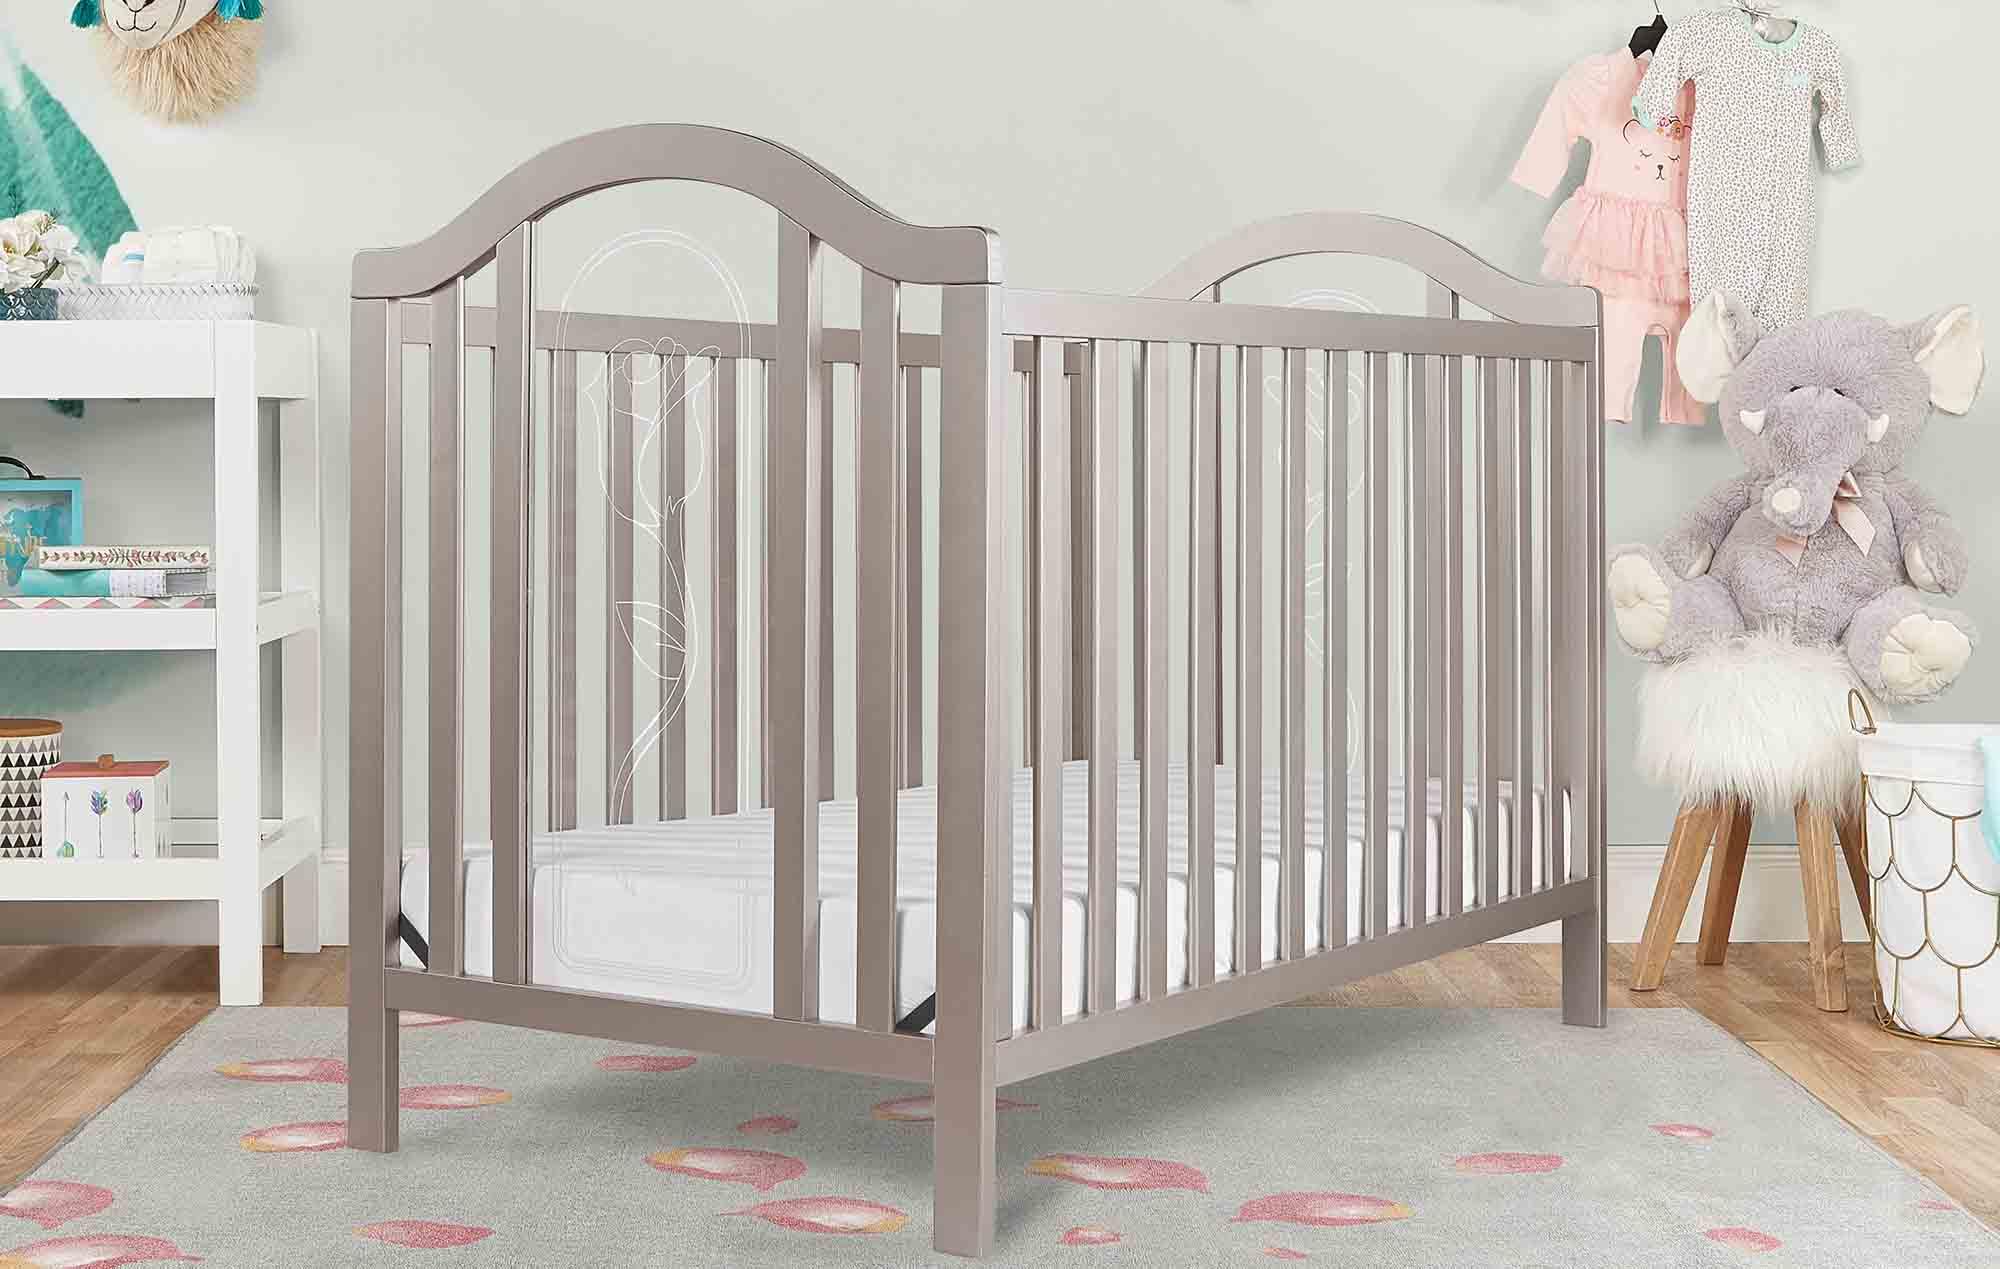 762-GD Ariel Crib Room Shot